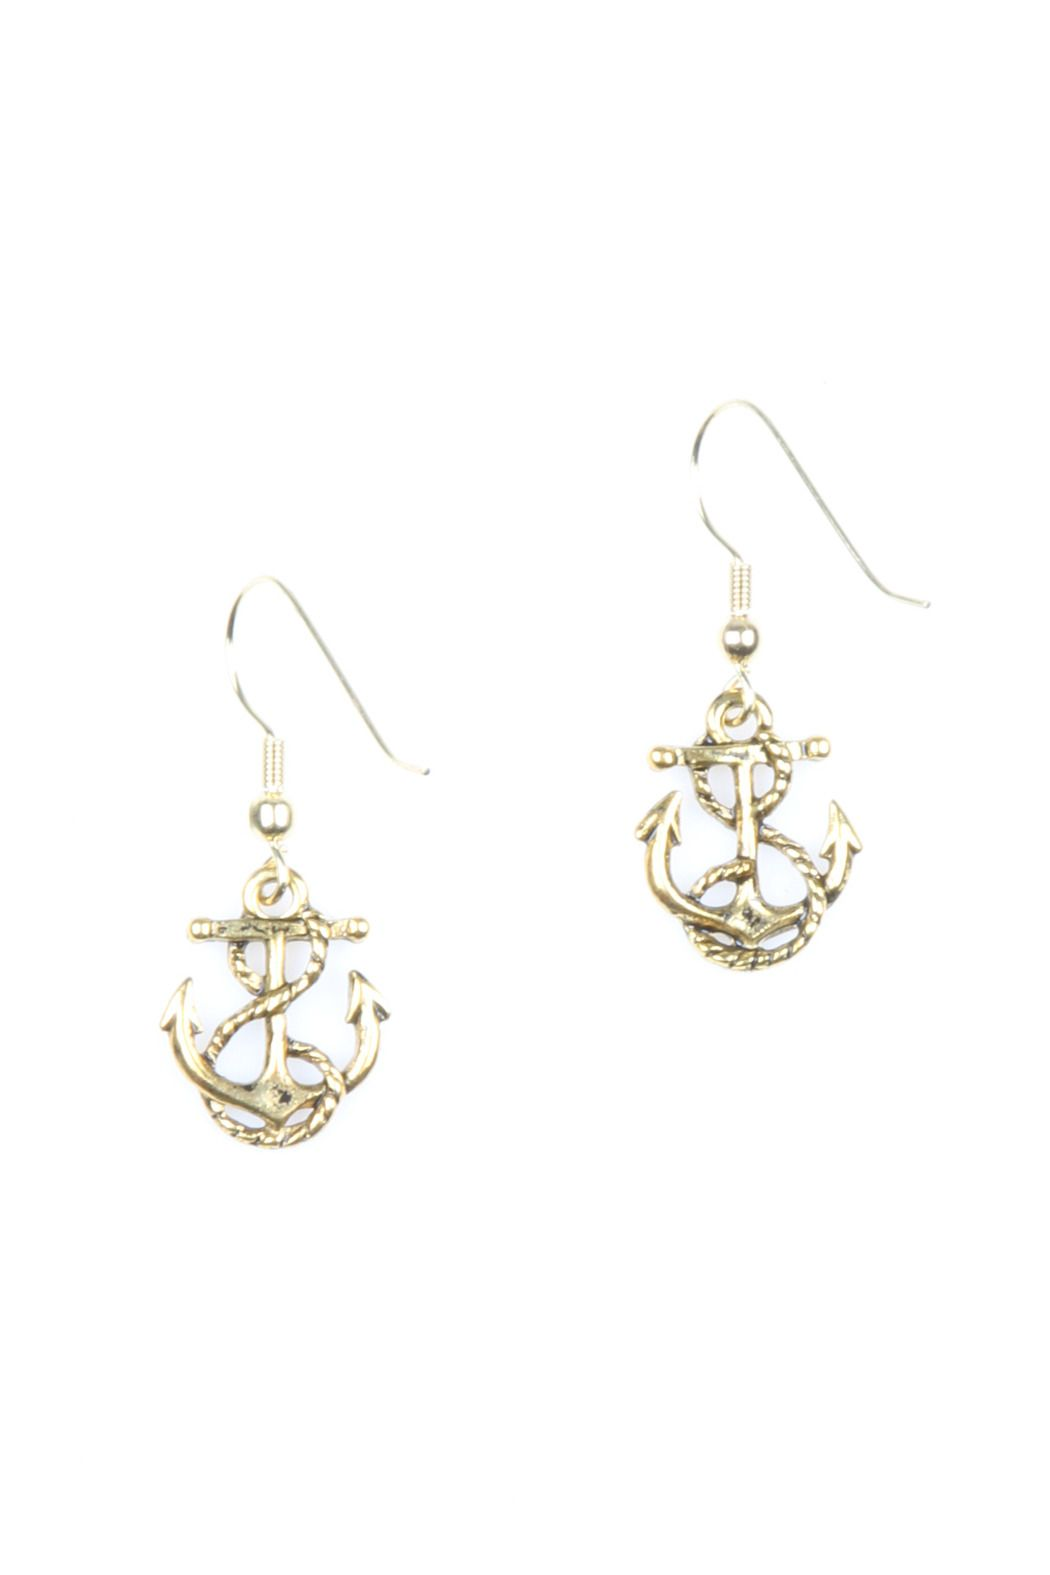 Bliss Anchor Earrings | Anchor earrings, Nautical anchor ...